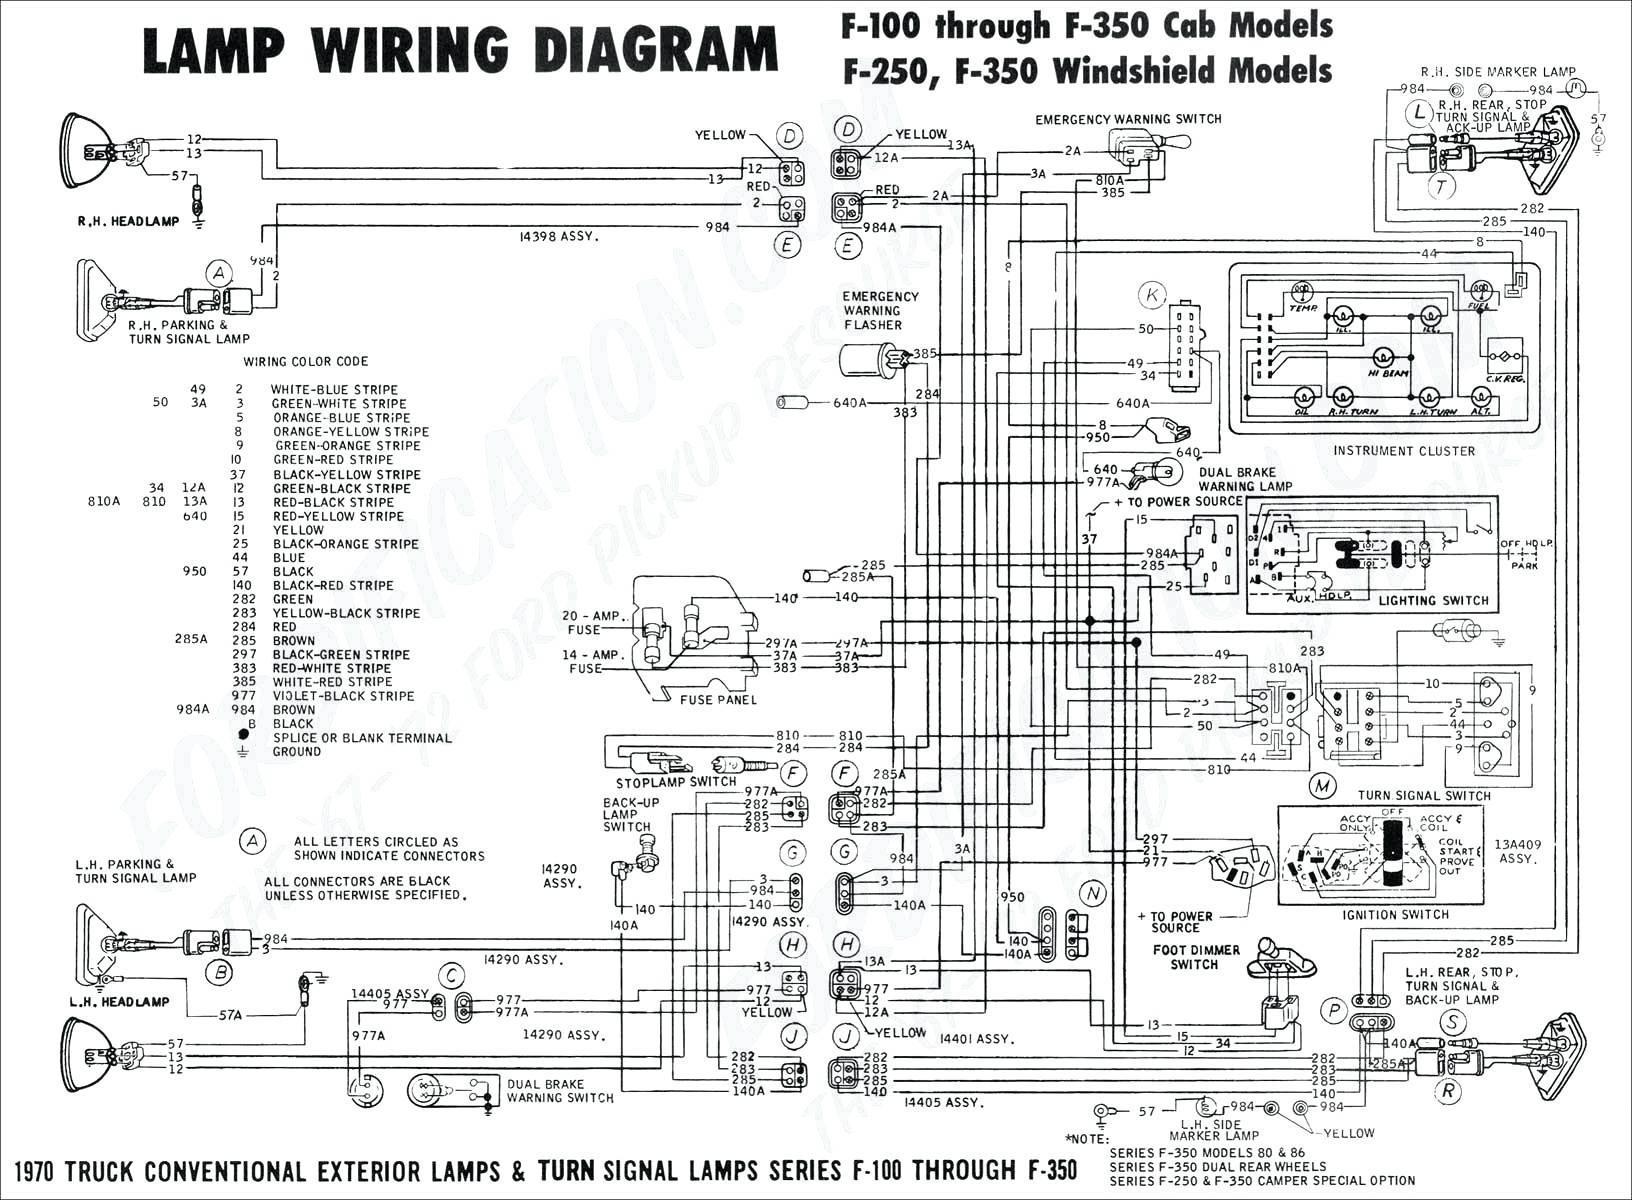 2007 Freightliner Columbia Fuse Diagram Wiring Diagram Technic 2005 Freightliner Columbia Fuse Panel Diagram